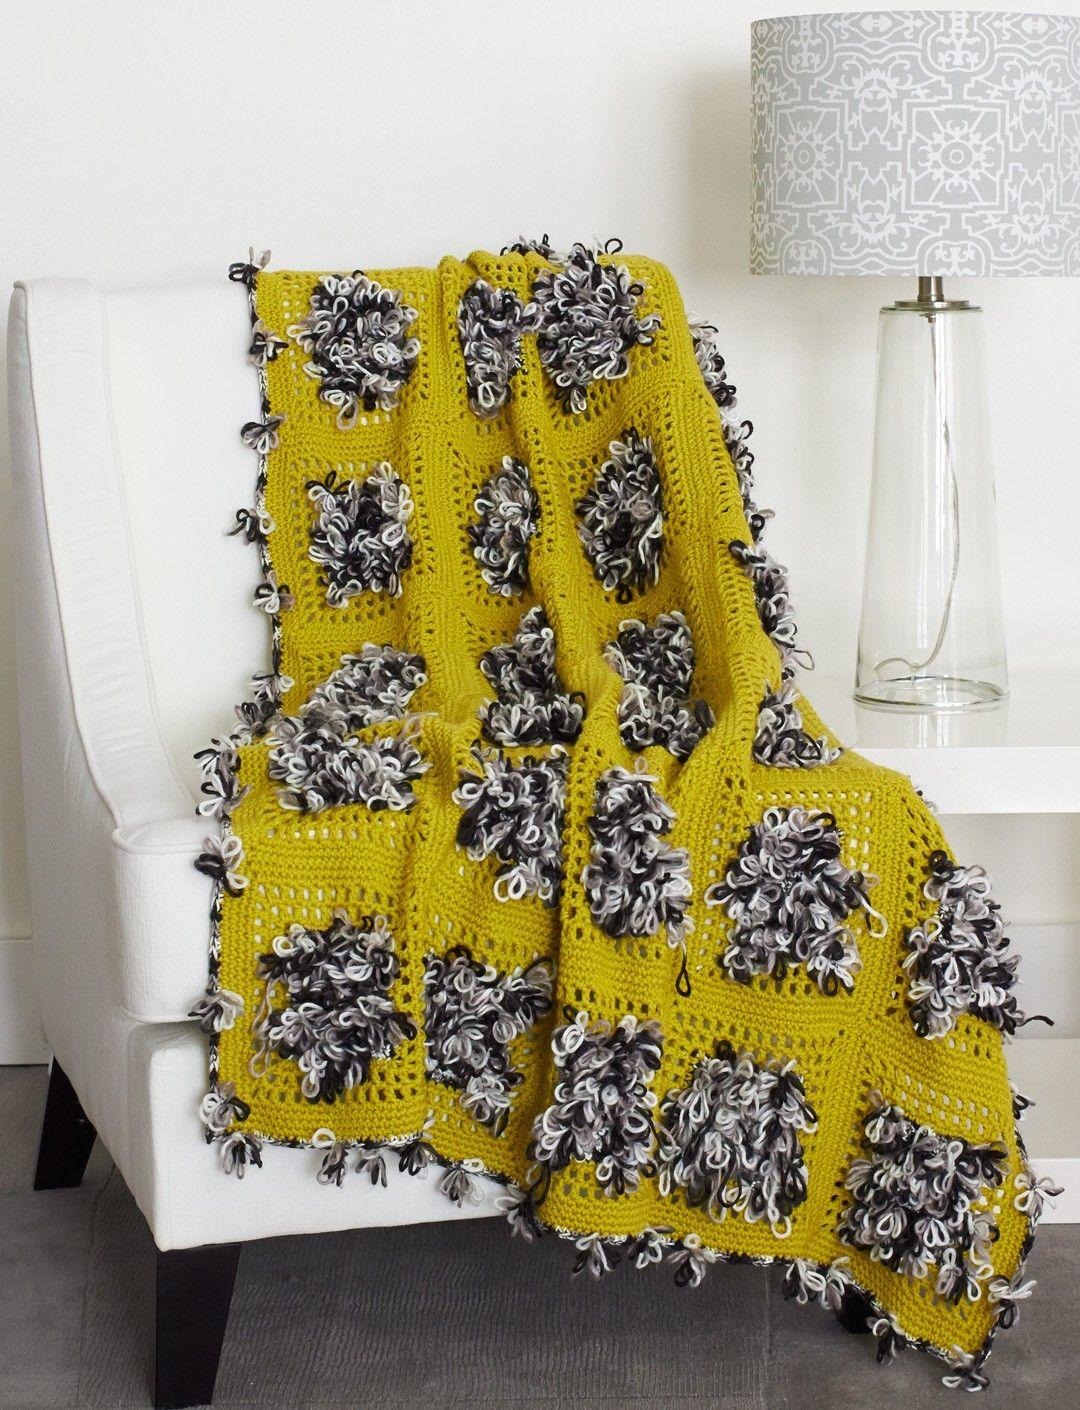 Yarnspirations bernat throw for a loop patterns free crochet bankloansurffo Images